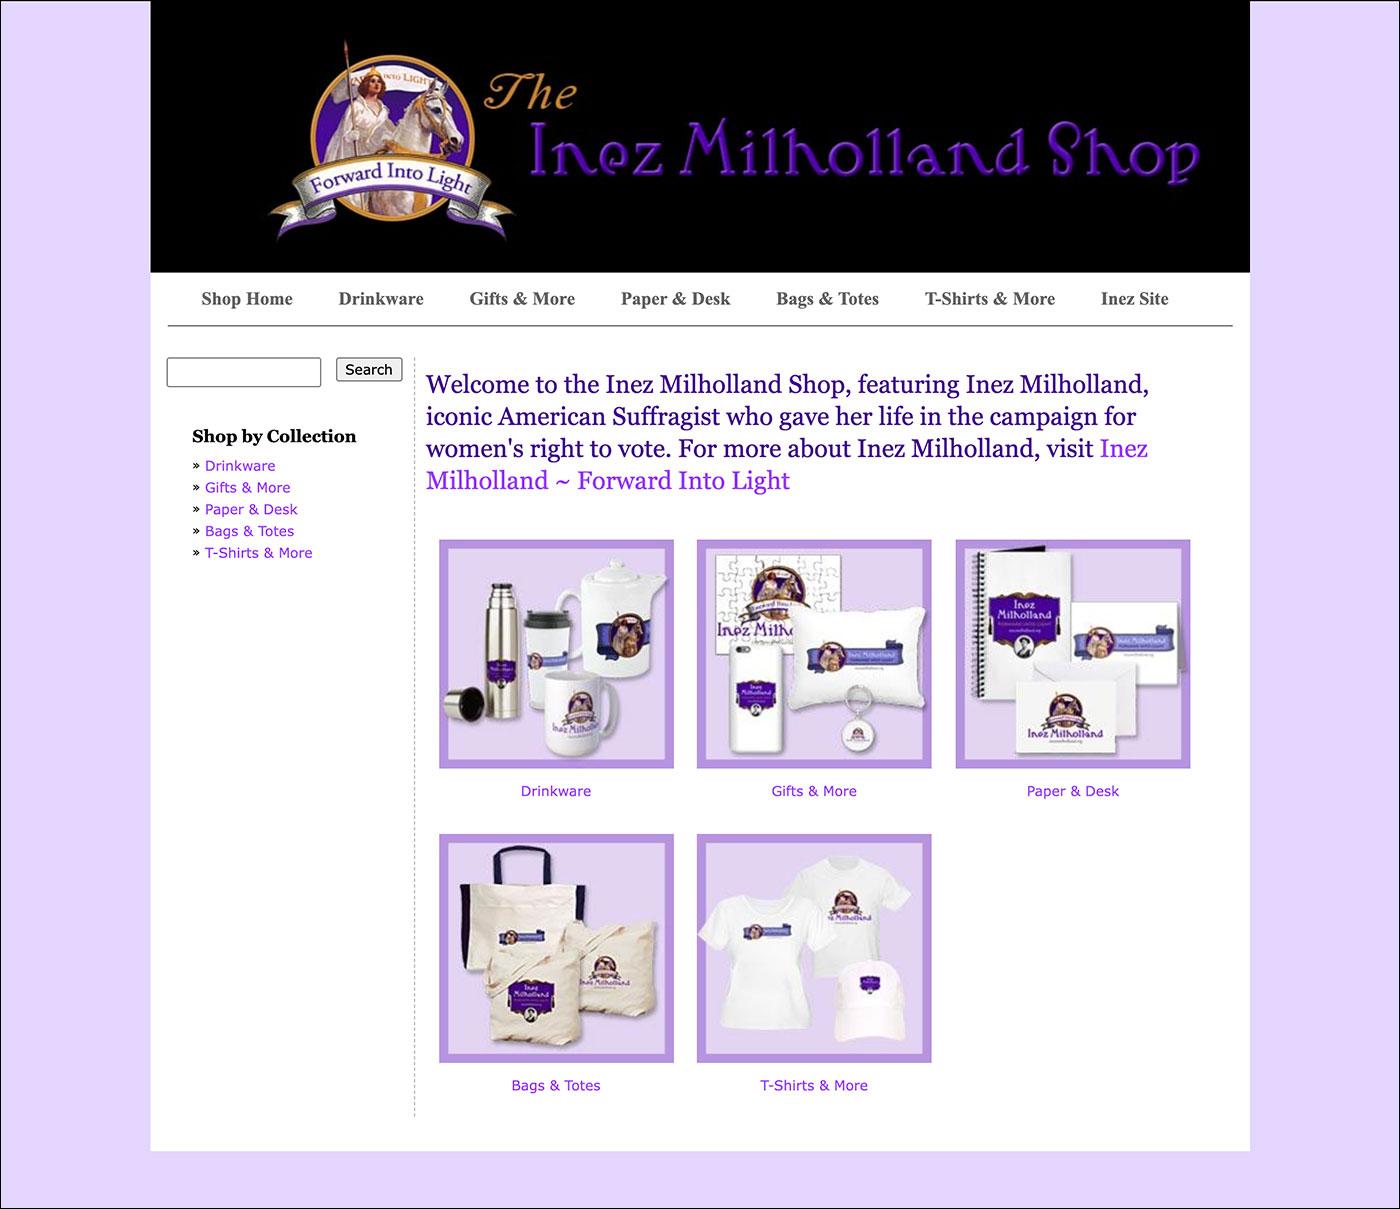 Inez Milholland Shop